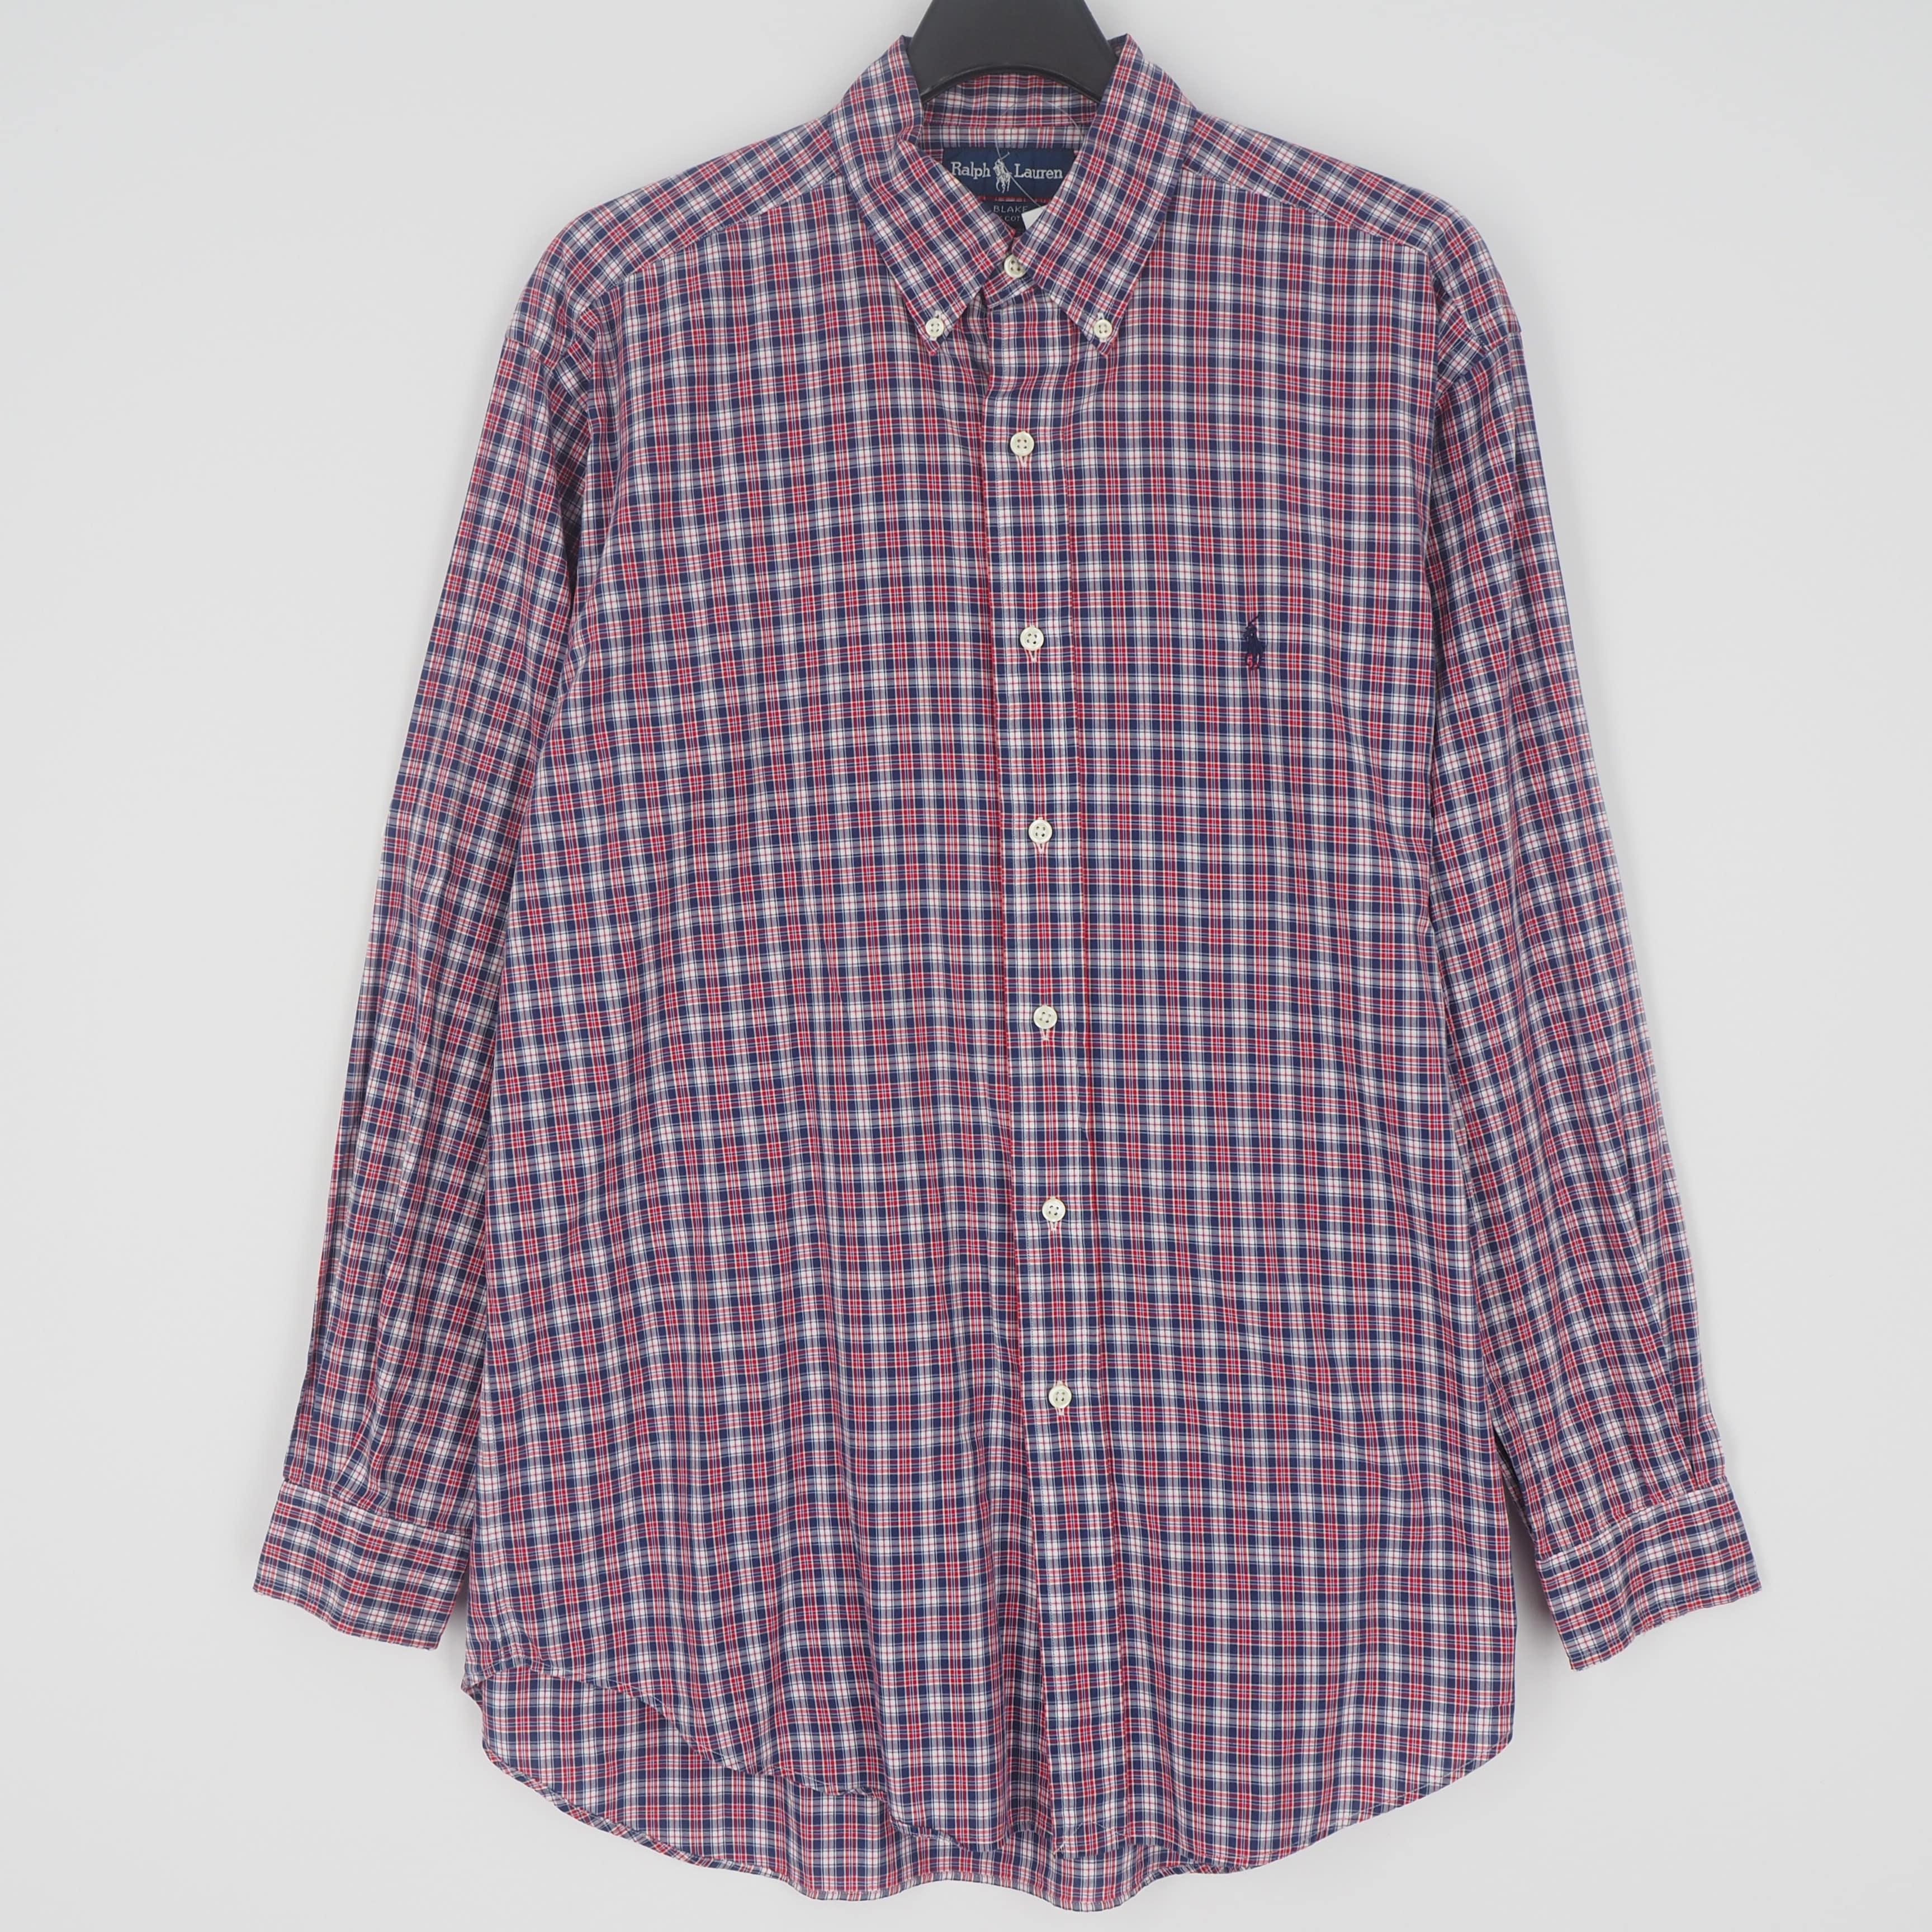 [XXL] 랄프로렌 긴팔 셔츠